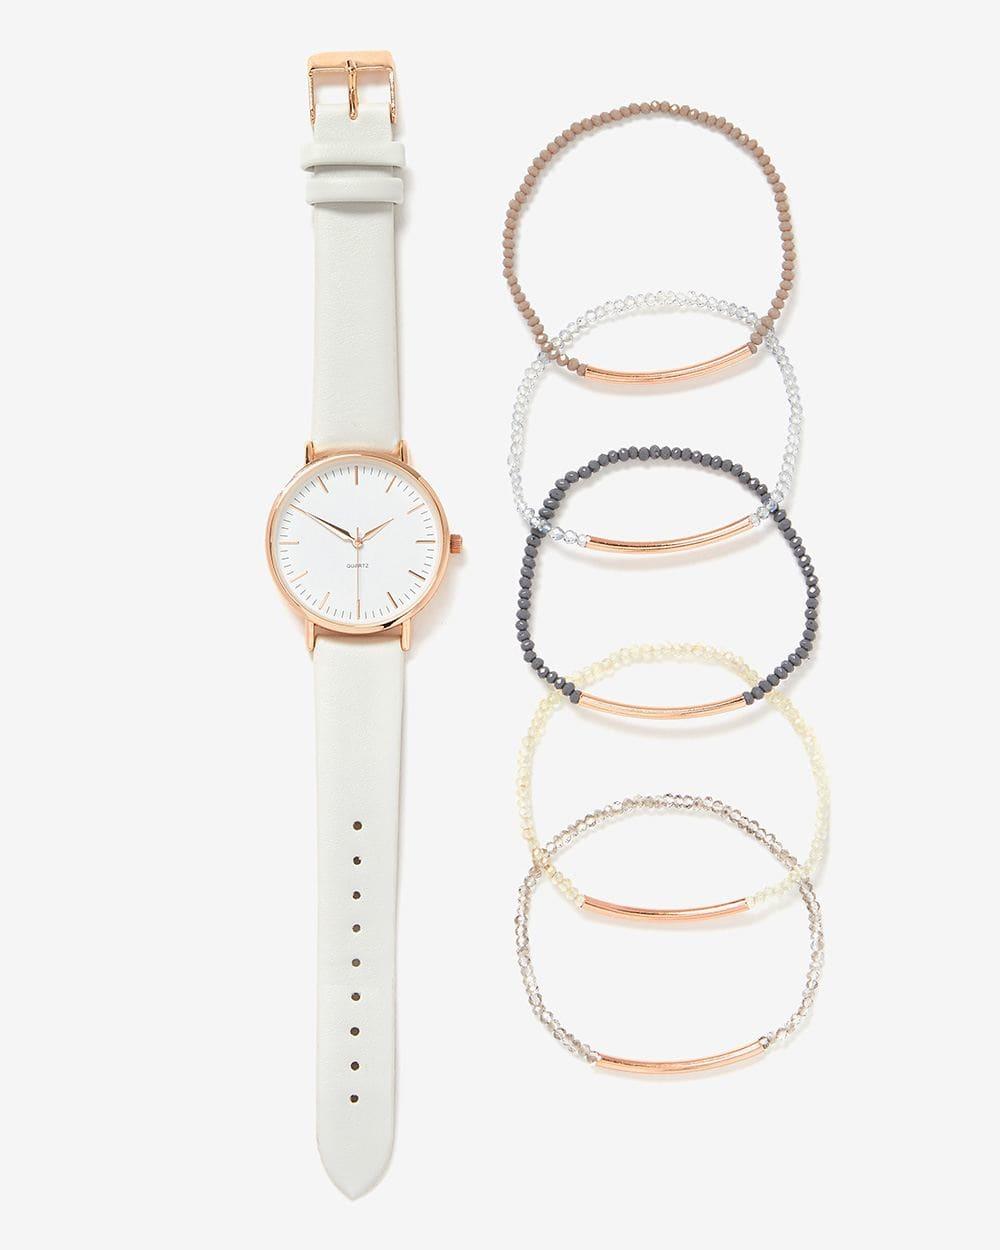 Set of Wristwatch and Bracelets